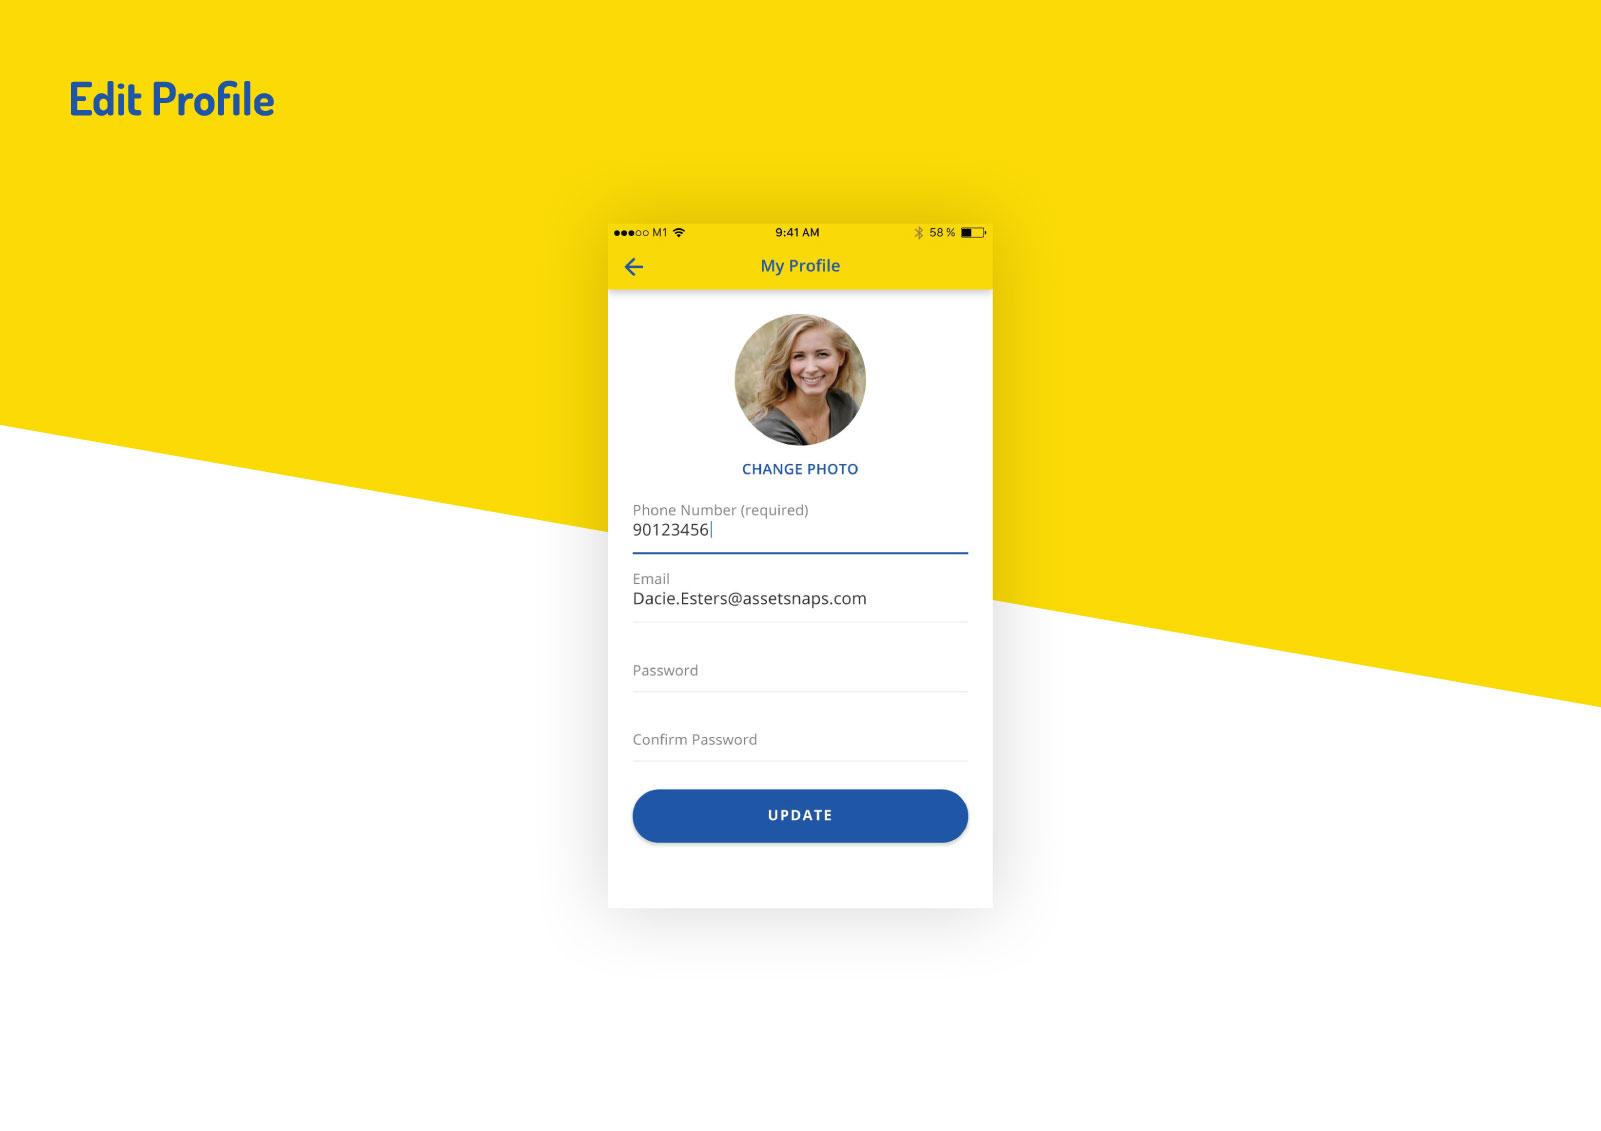 Asset Snaps - Edit Profile